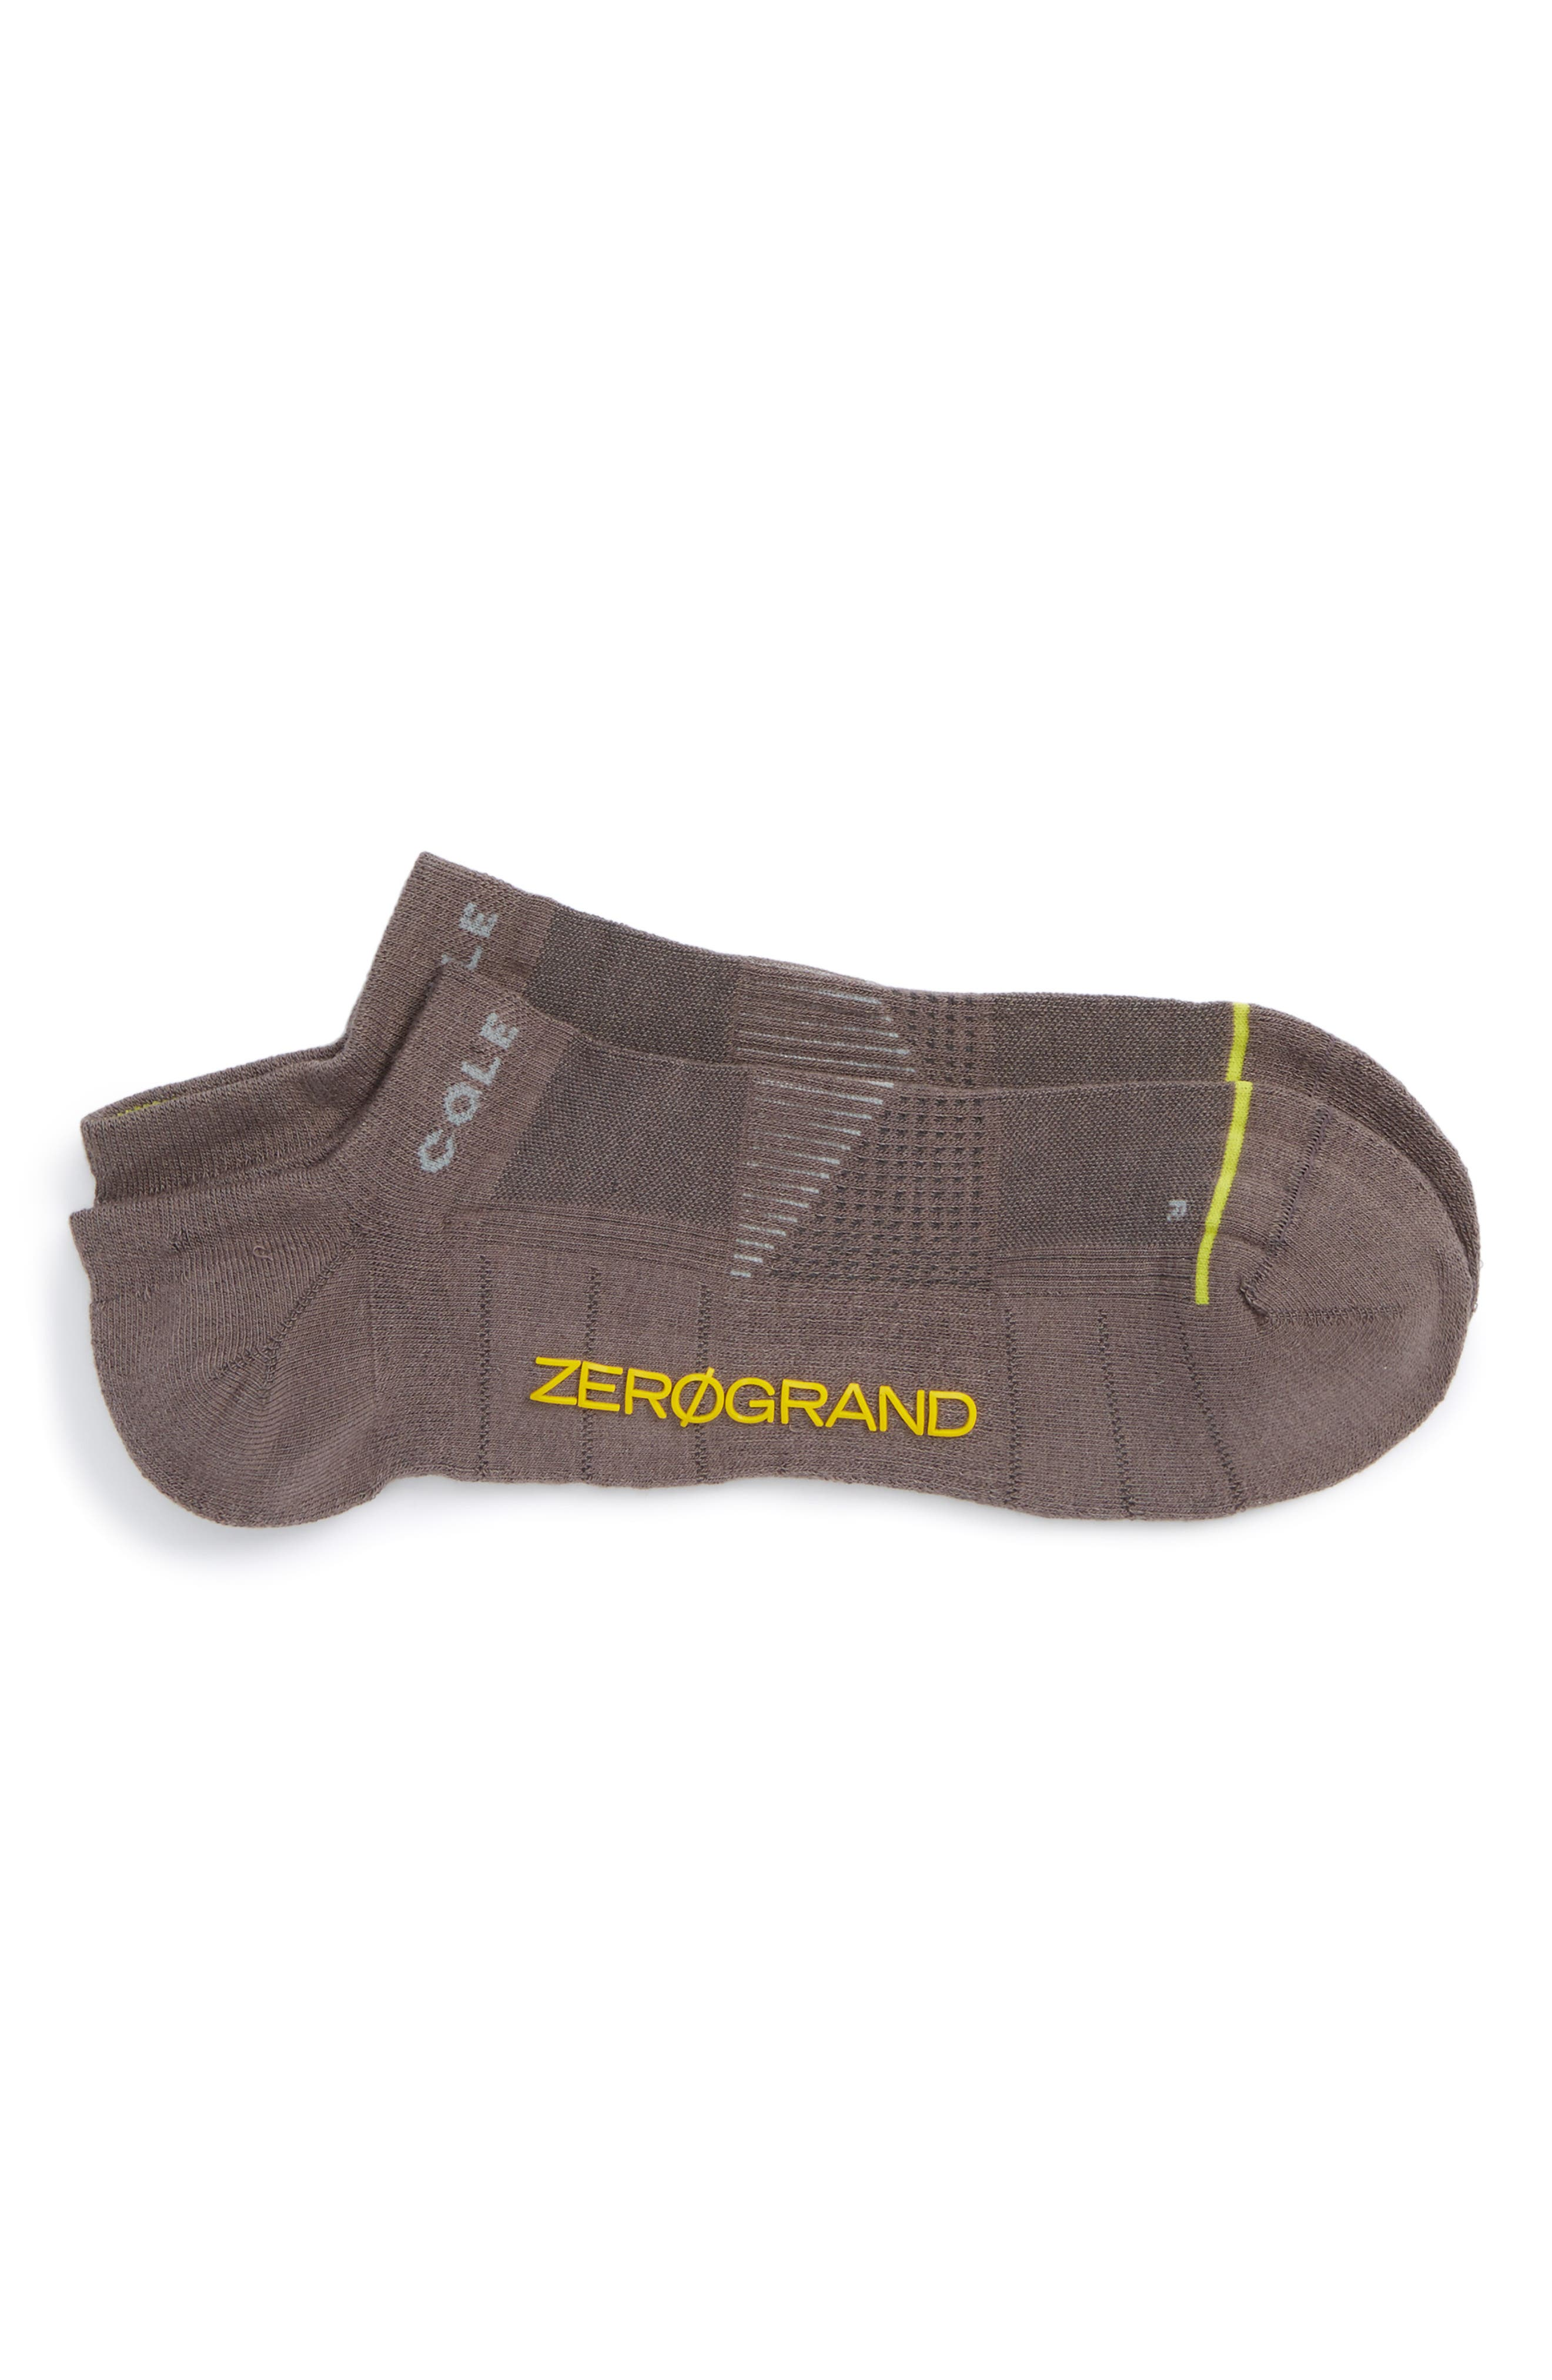 ZeroGrand Liner Socks,                         Main,                         color, 031